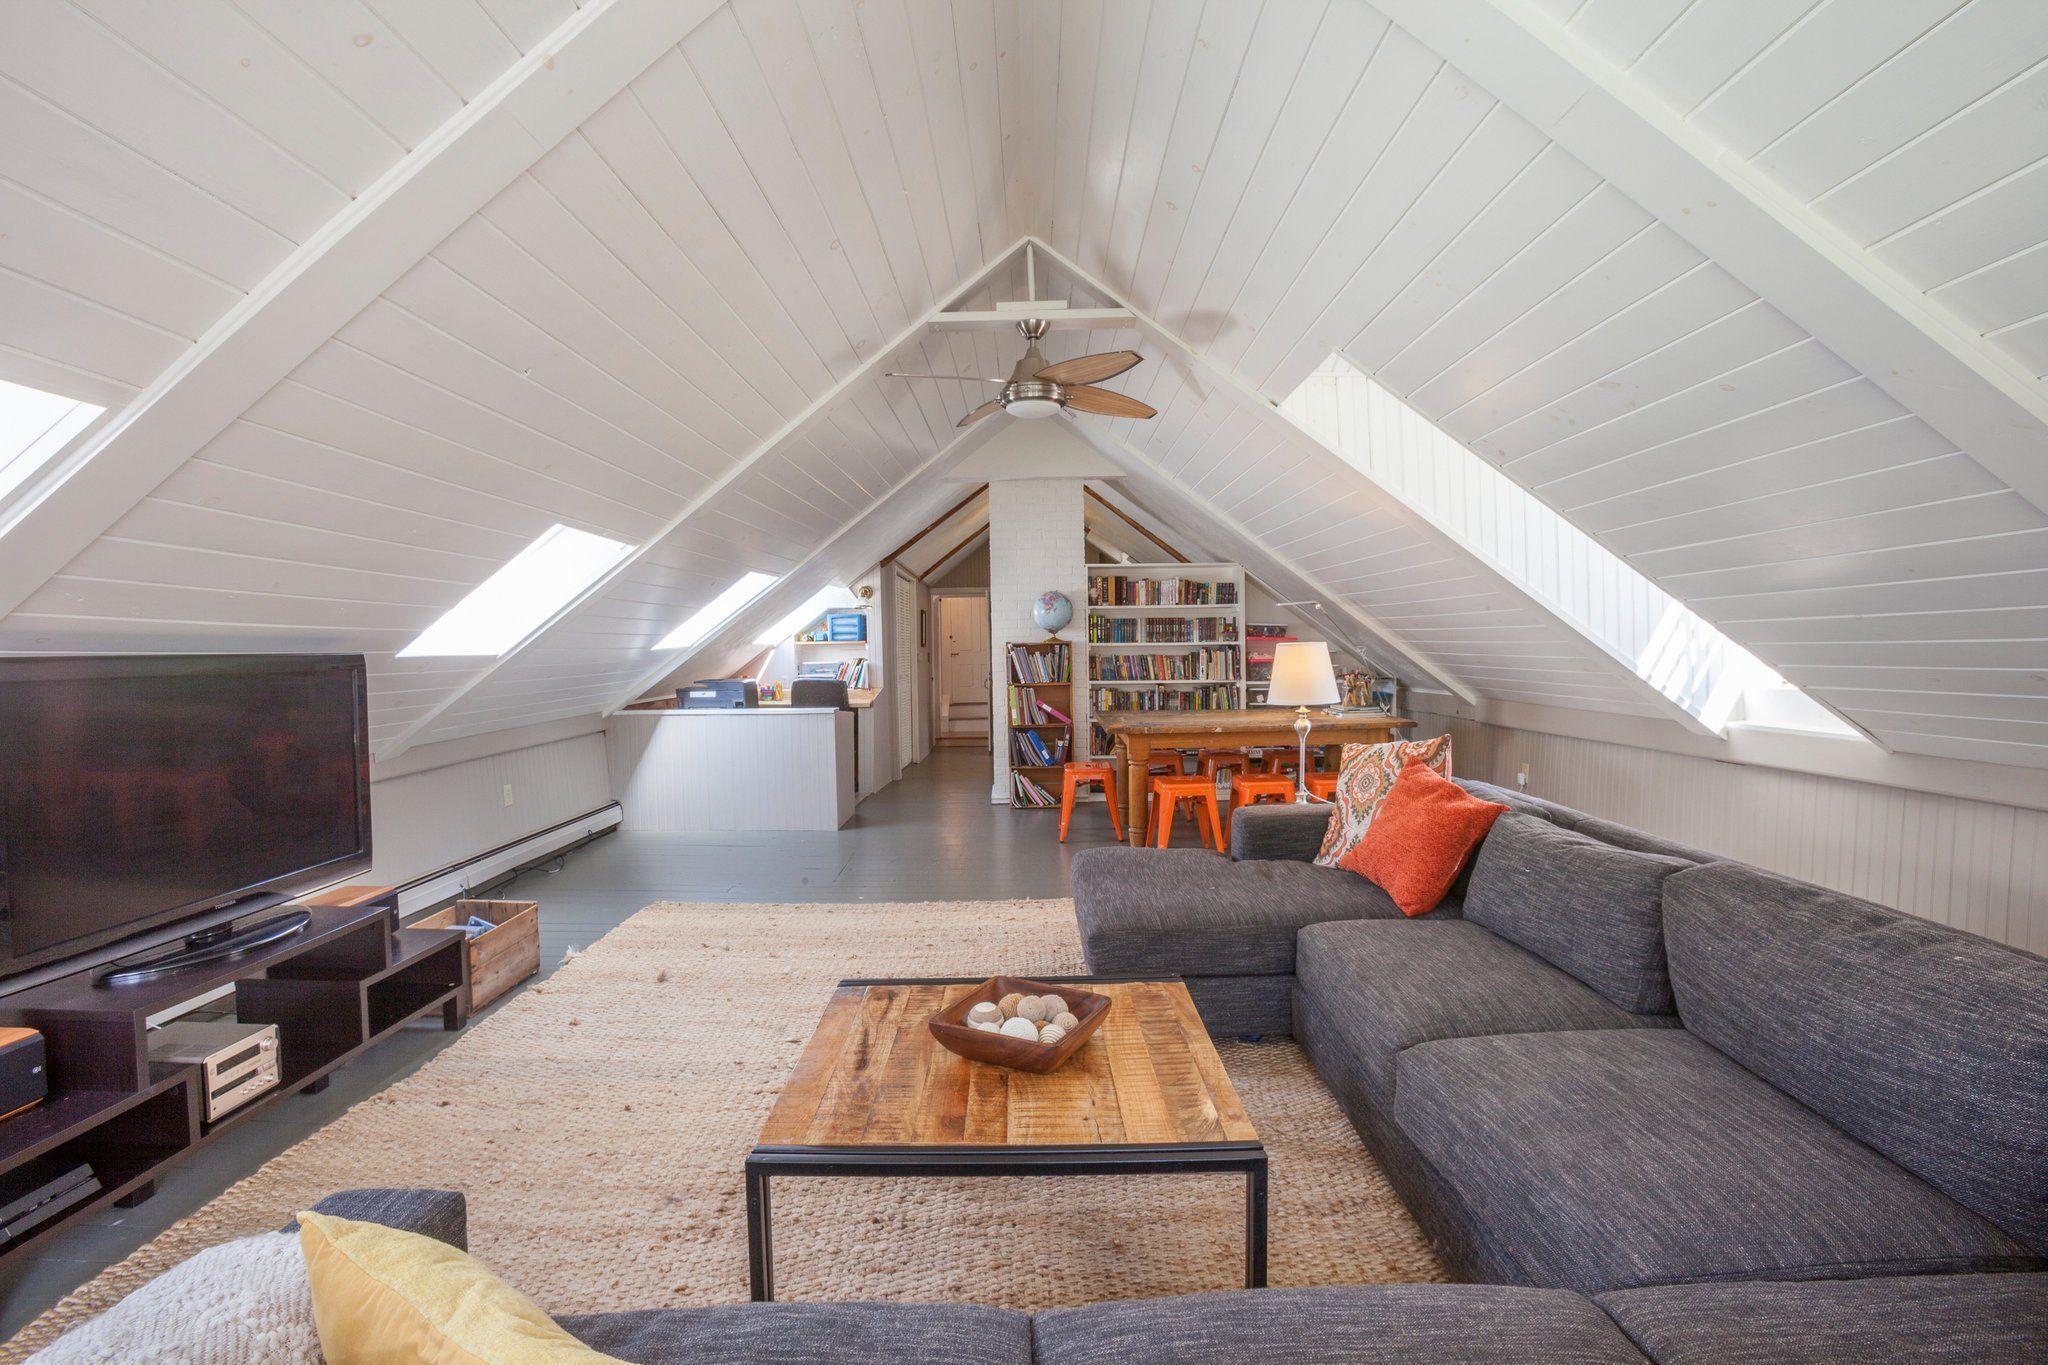 What You Get For 400 000 Dormer Windows Home Colonial Farmhouse